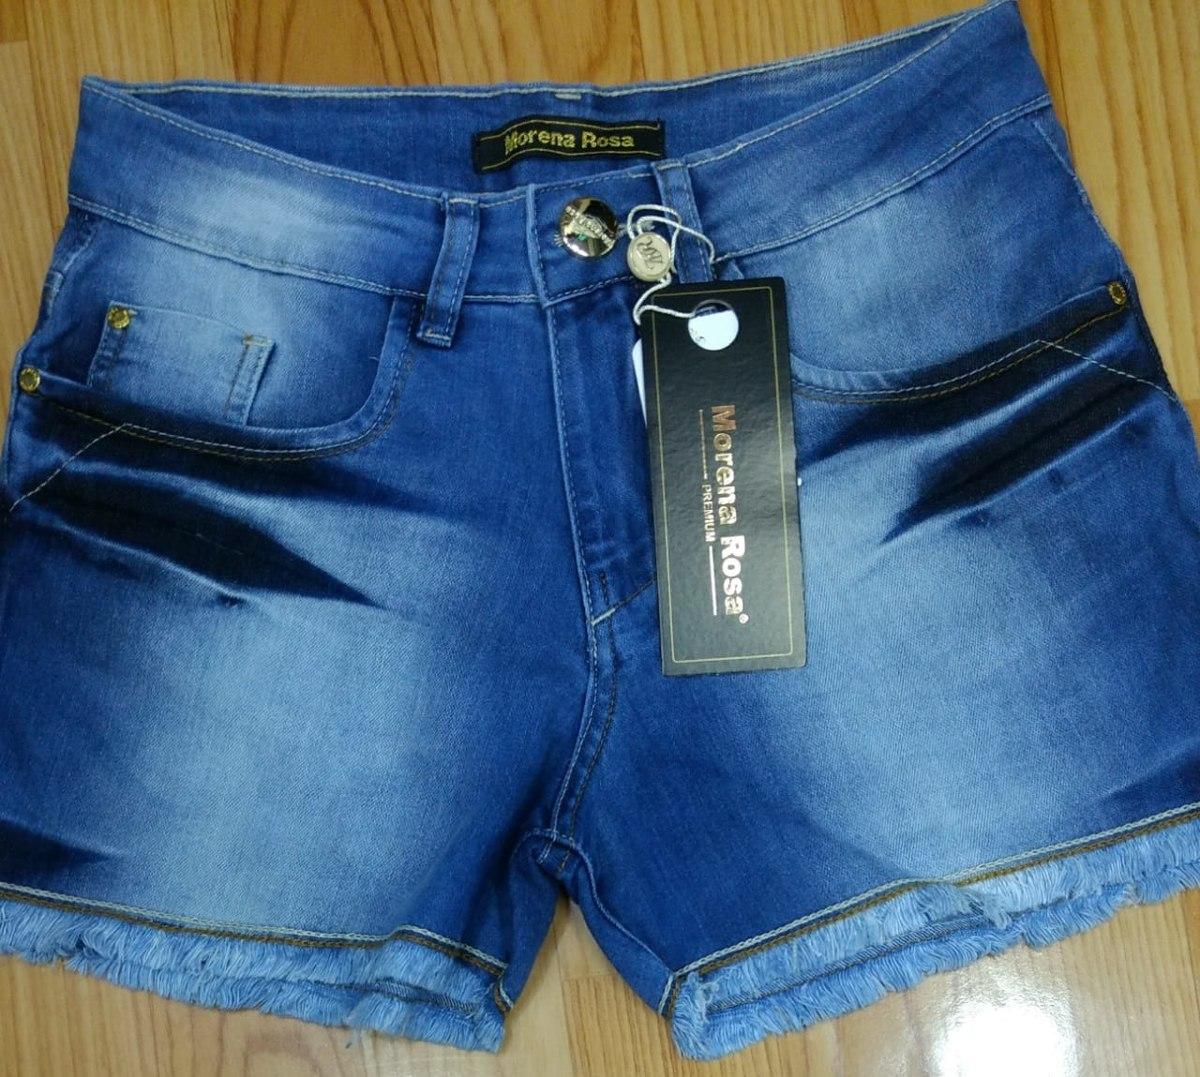 Shorts Jeans 38 Shorts & Bermudas Damenmode